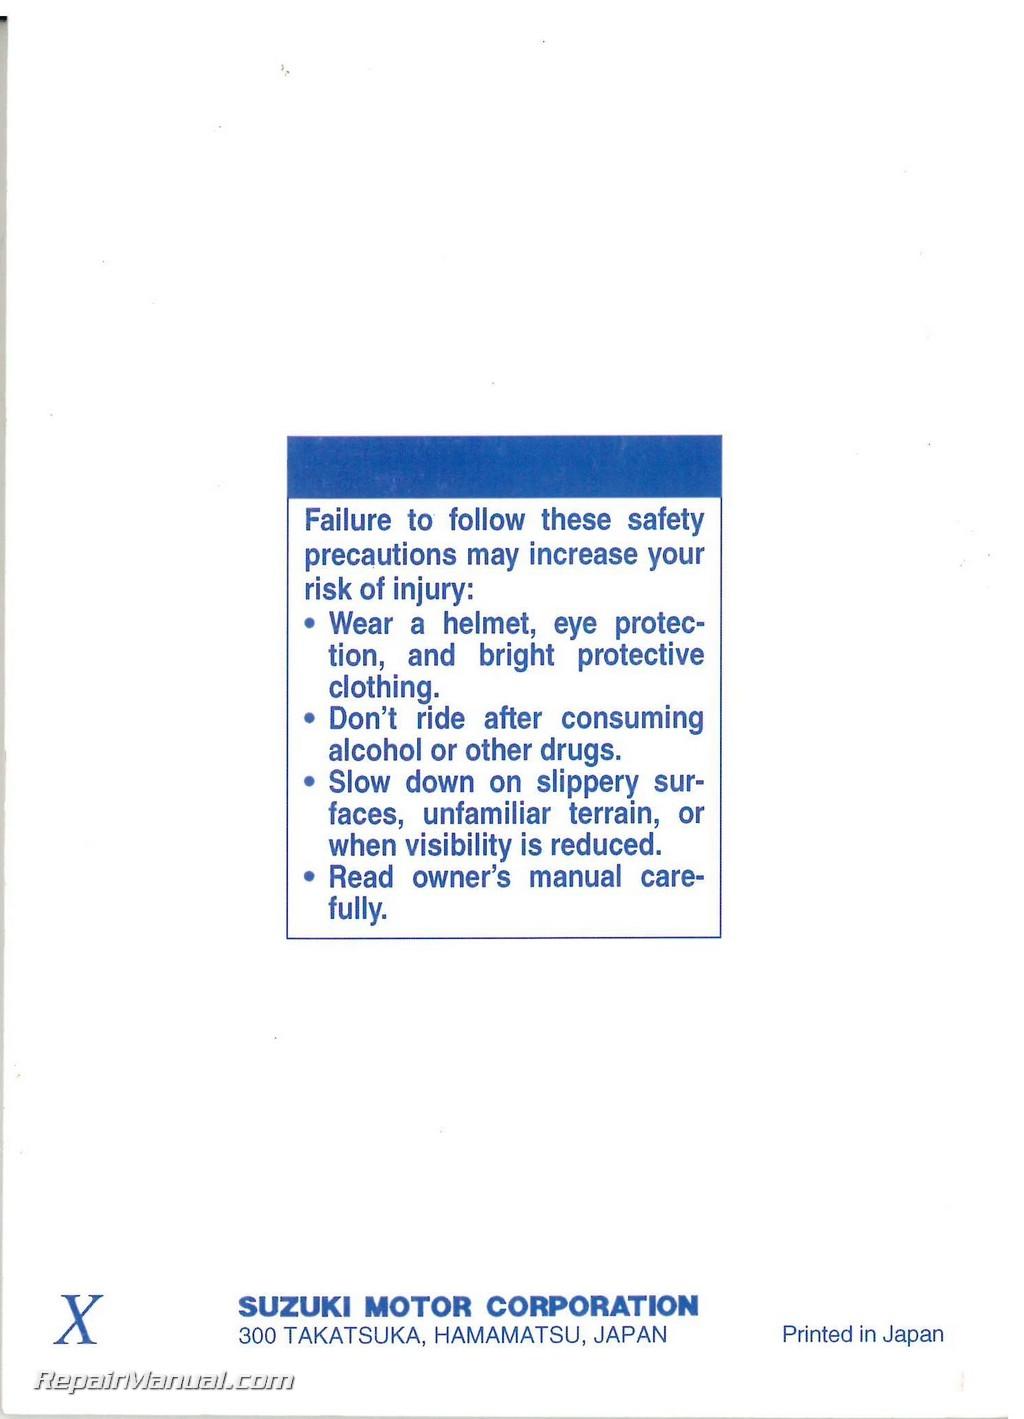 1999 Suzuki Gz250 Marauder Owners Manual